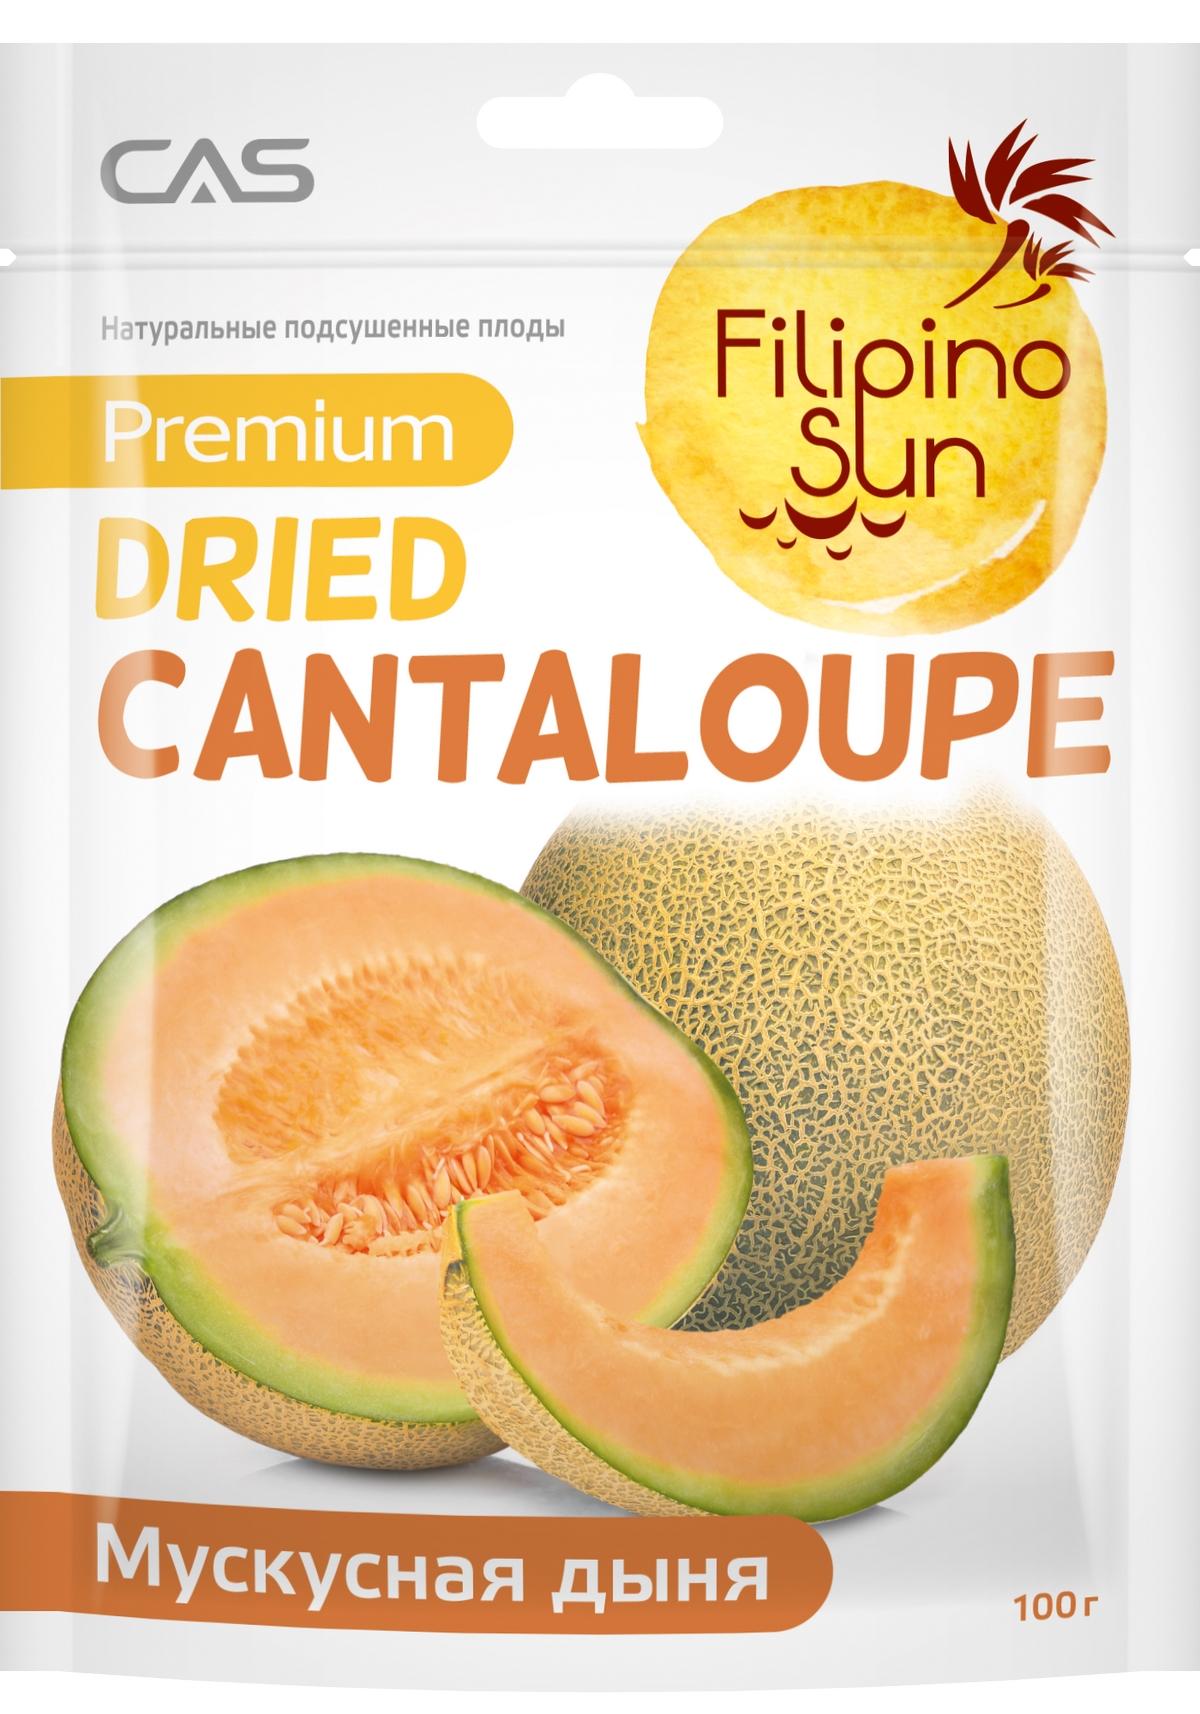 Плоды Мускусной дыни сушеной Filipino Sun